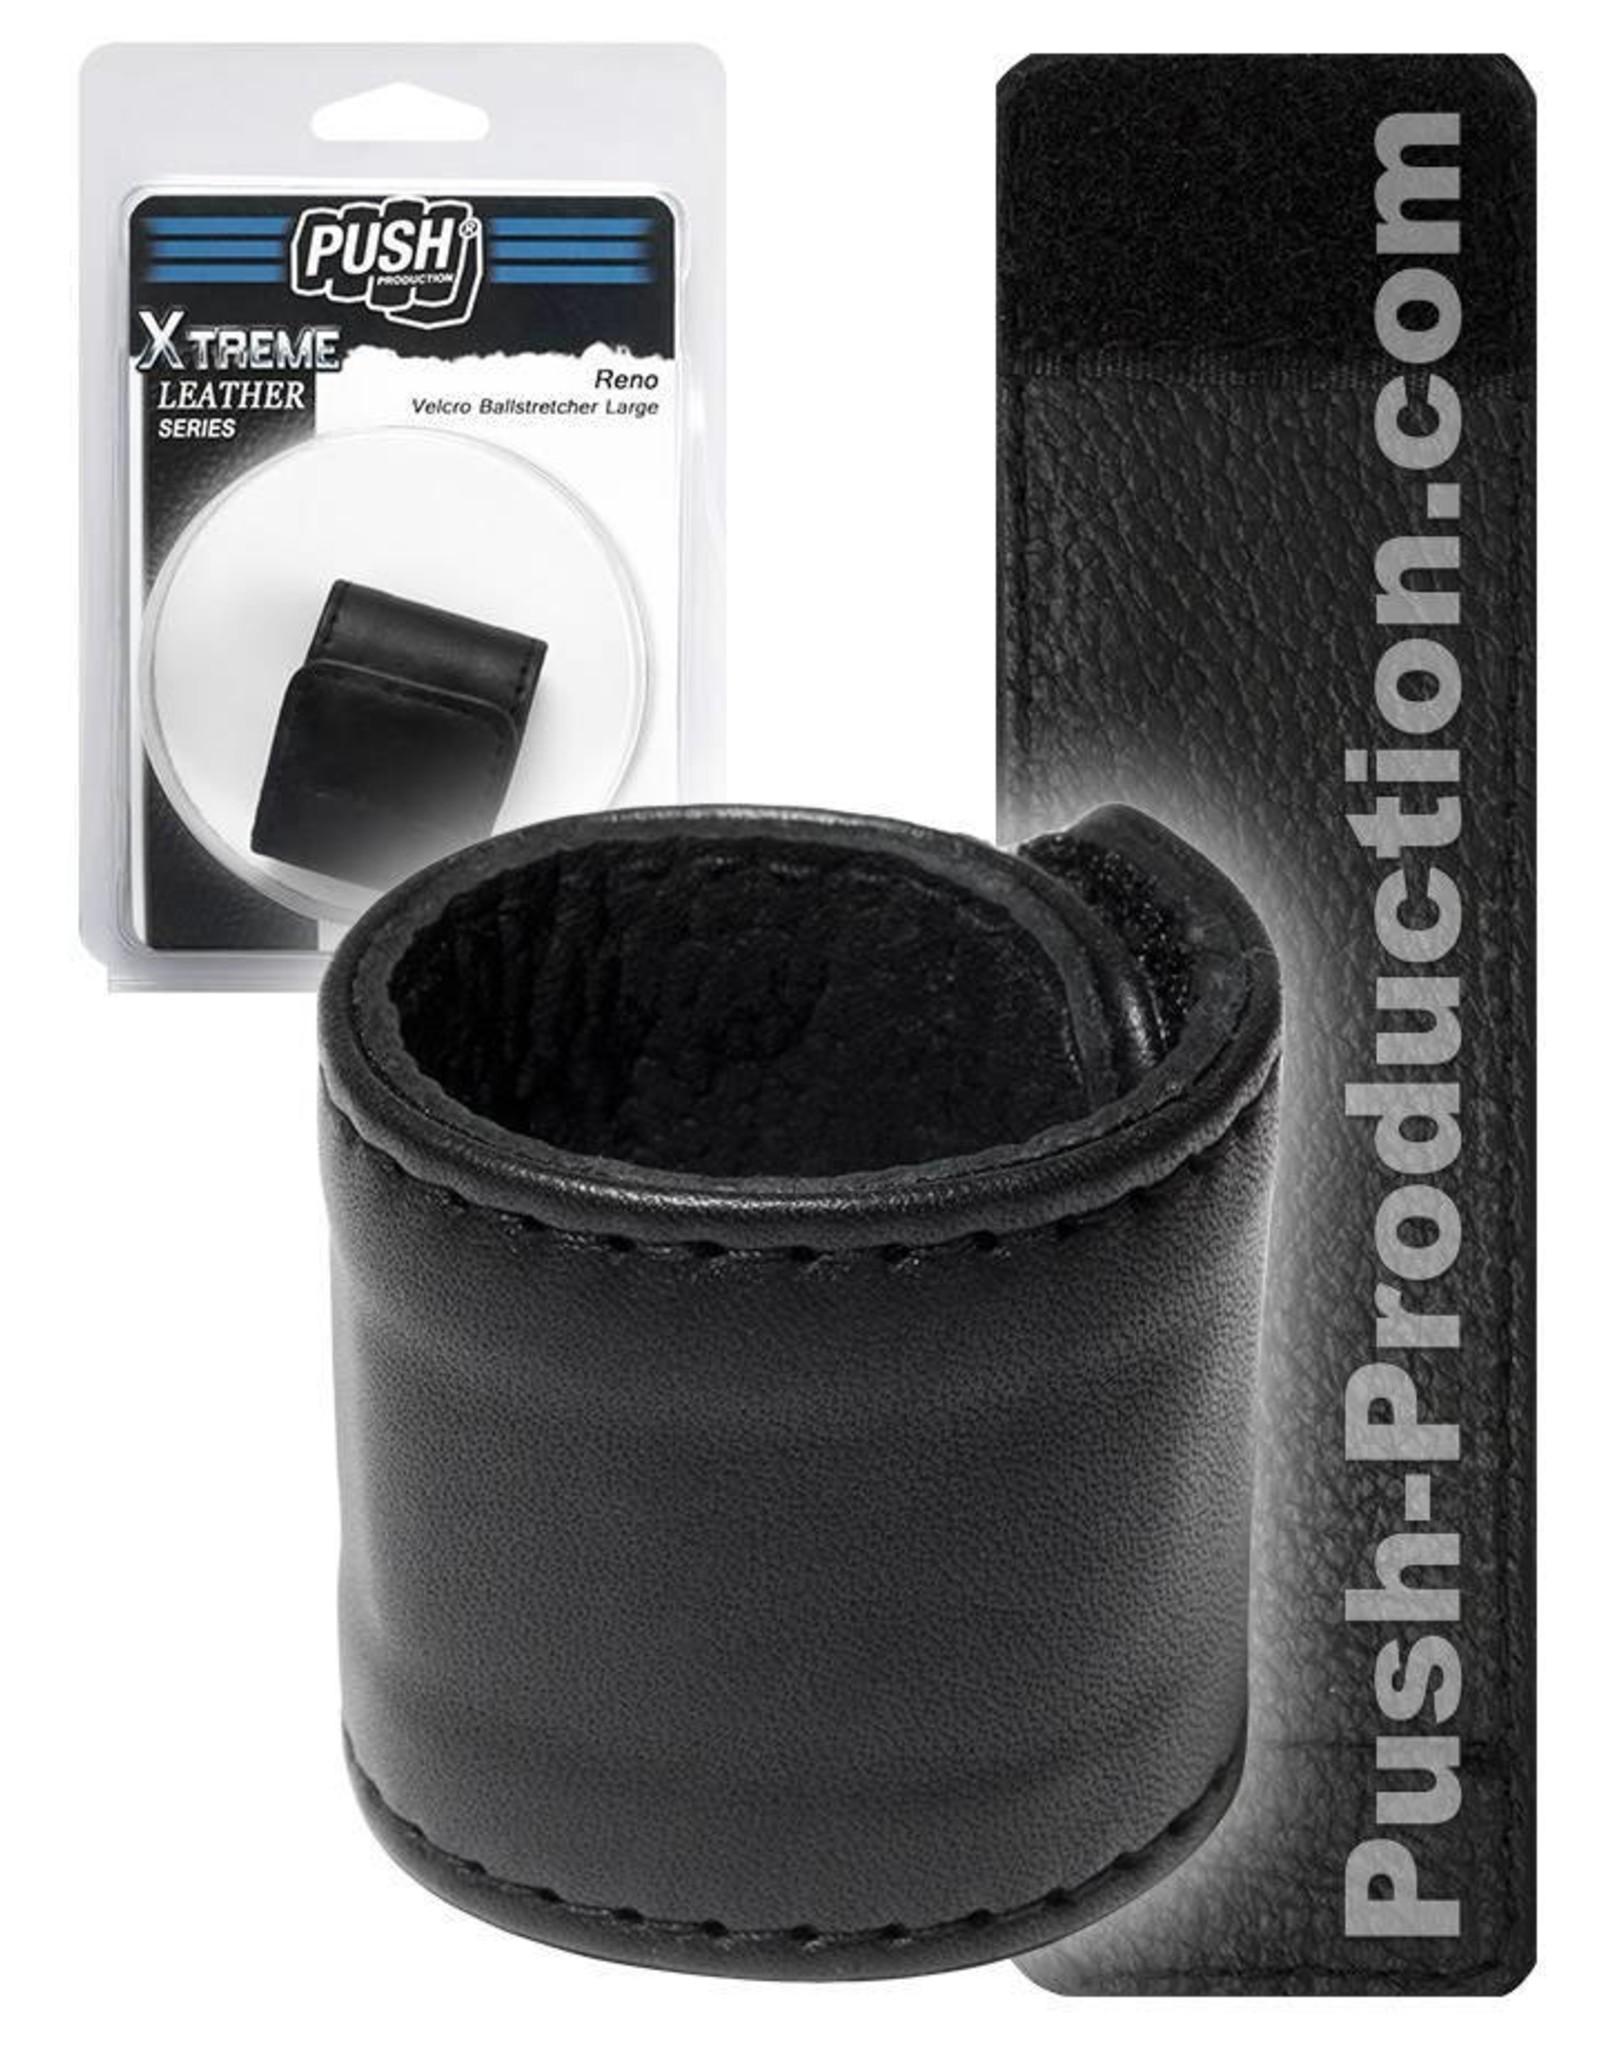 Push Xtreme Leather Reno Velcro Ballstretcher large